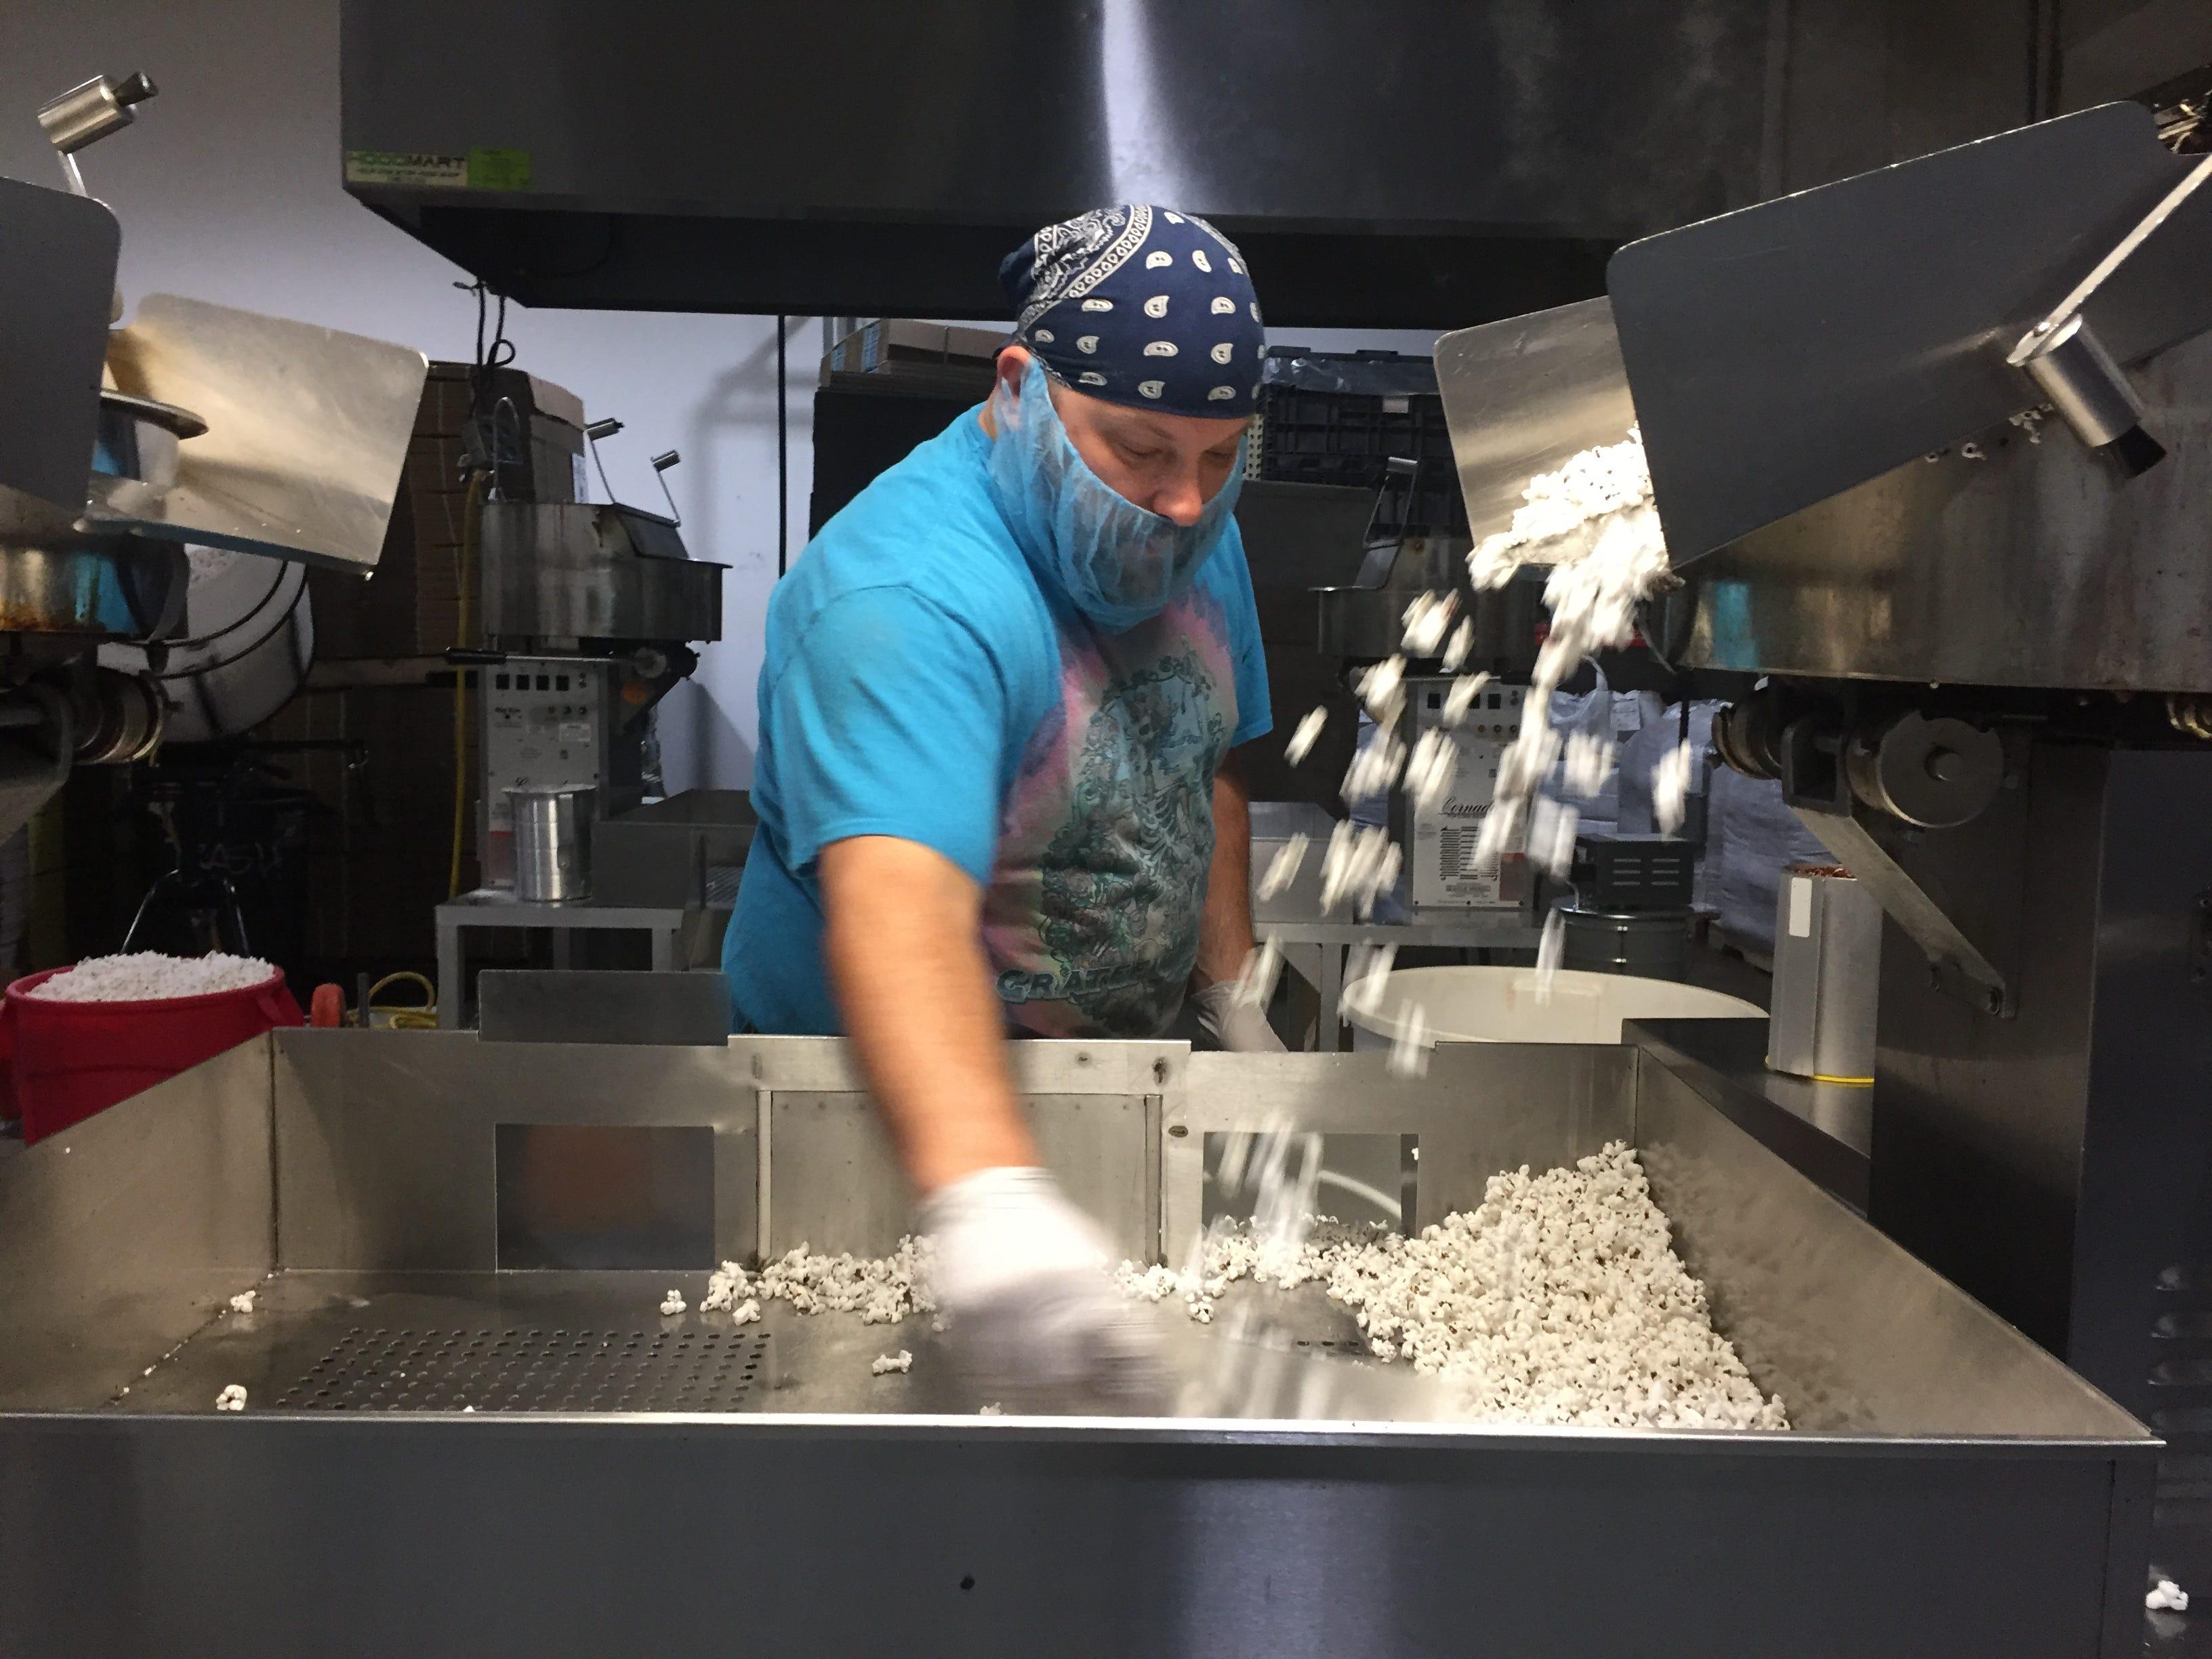 Livingston-made popcorn, pretzel maker growing into national